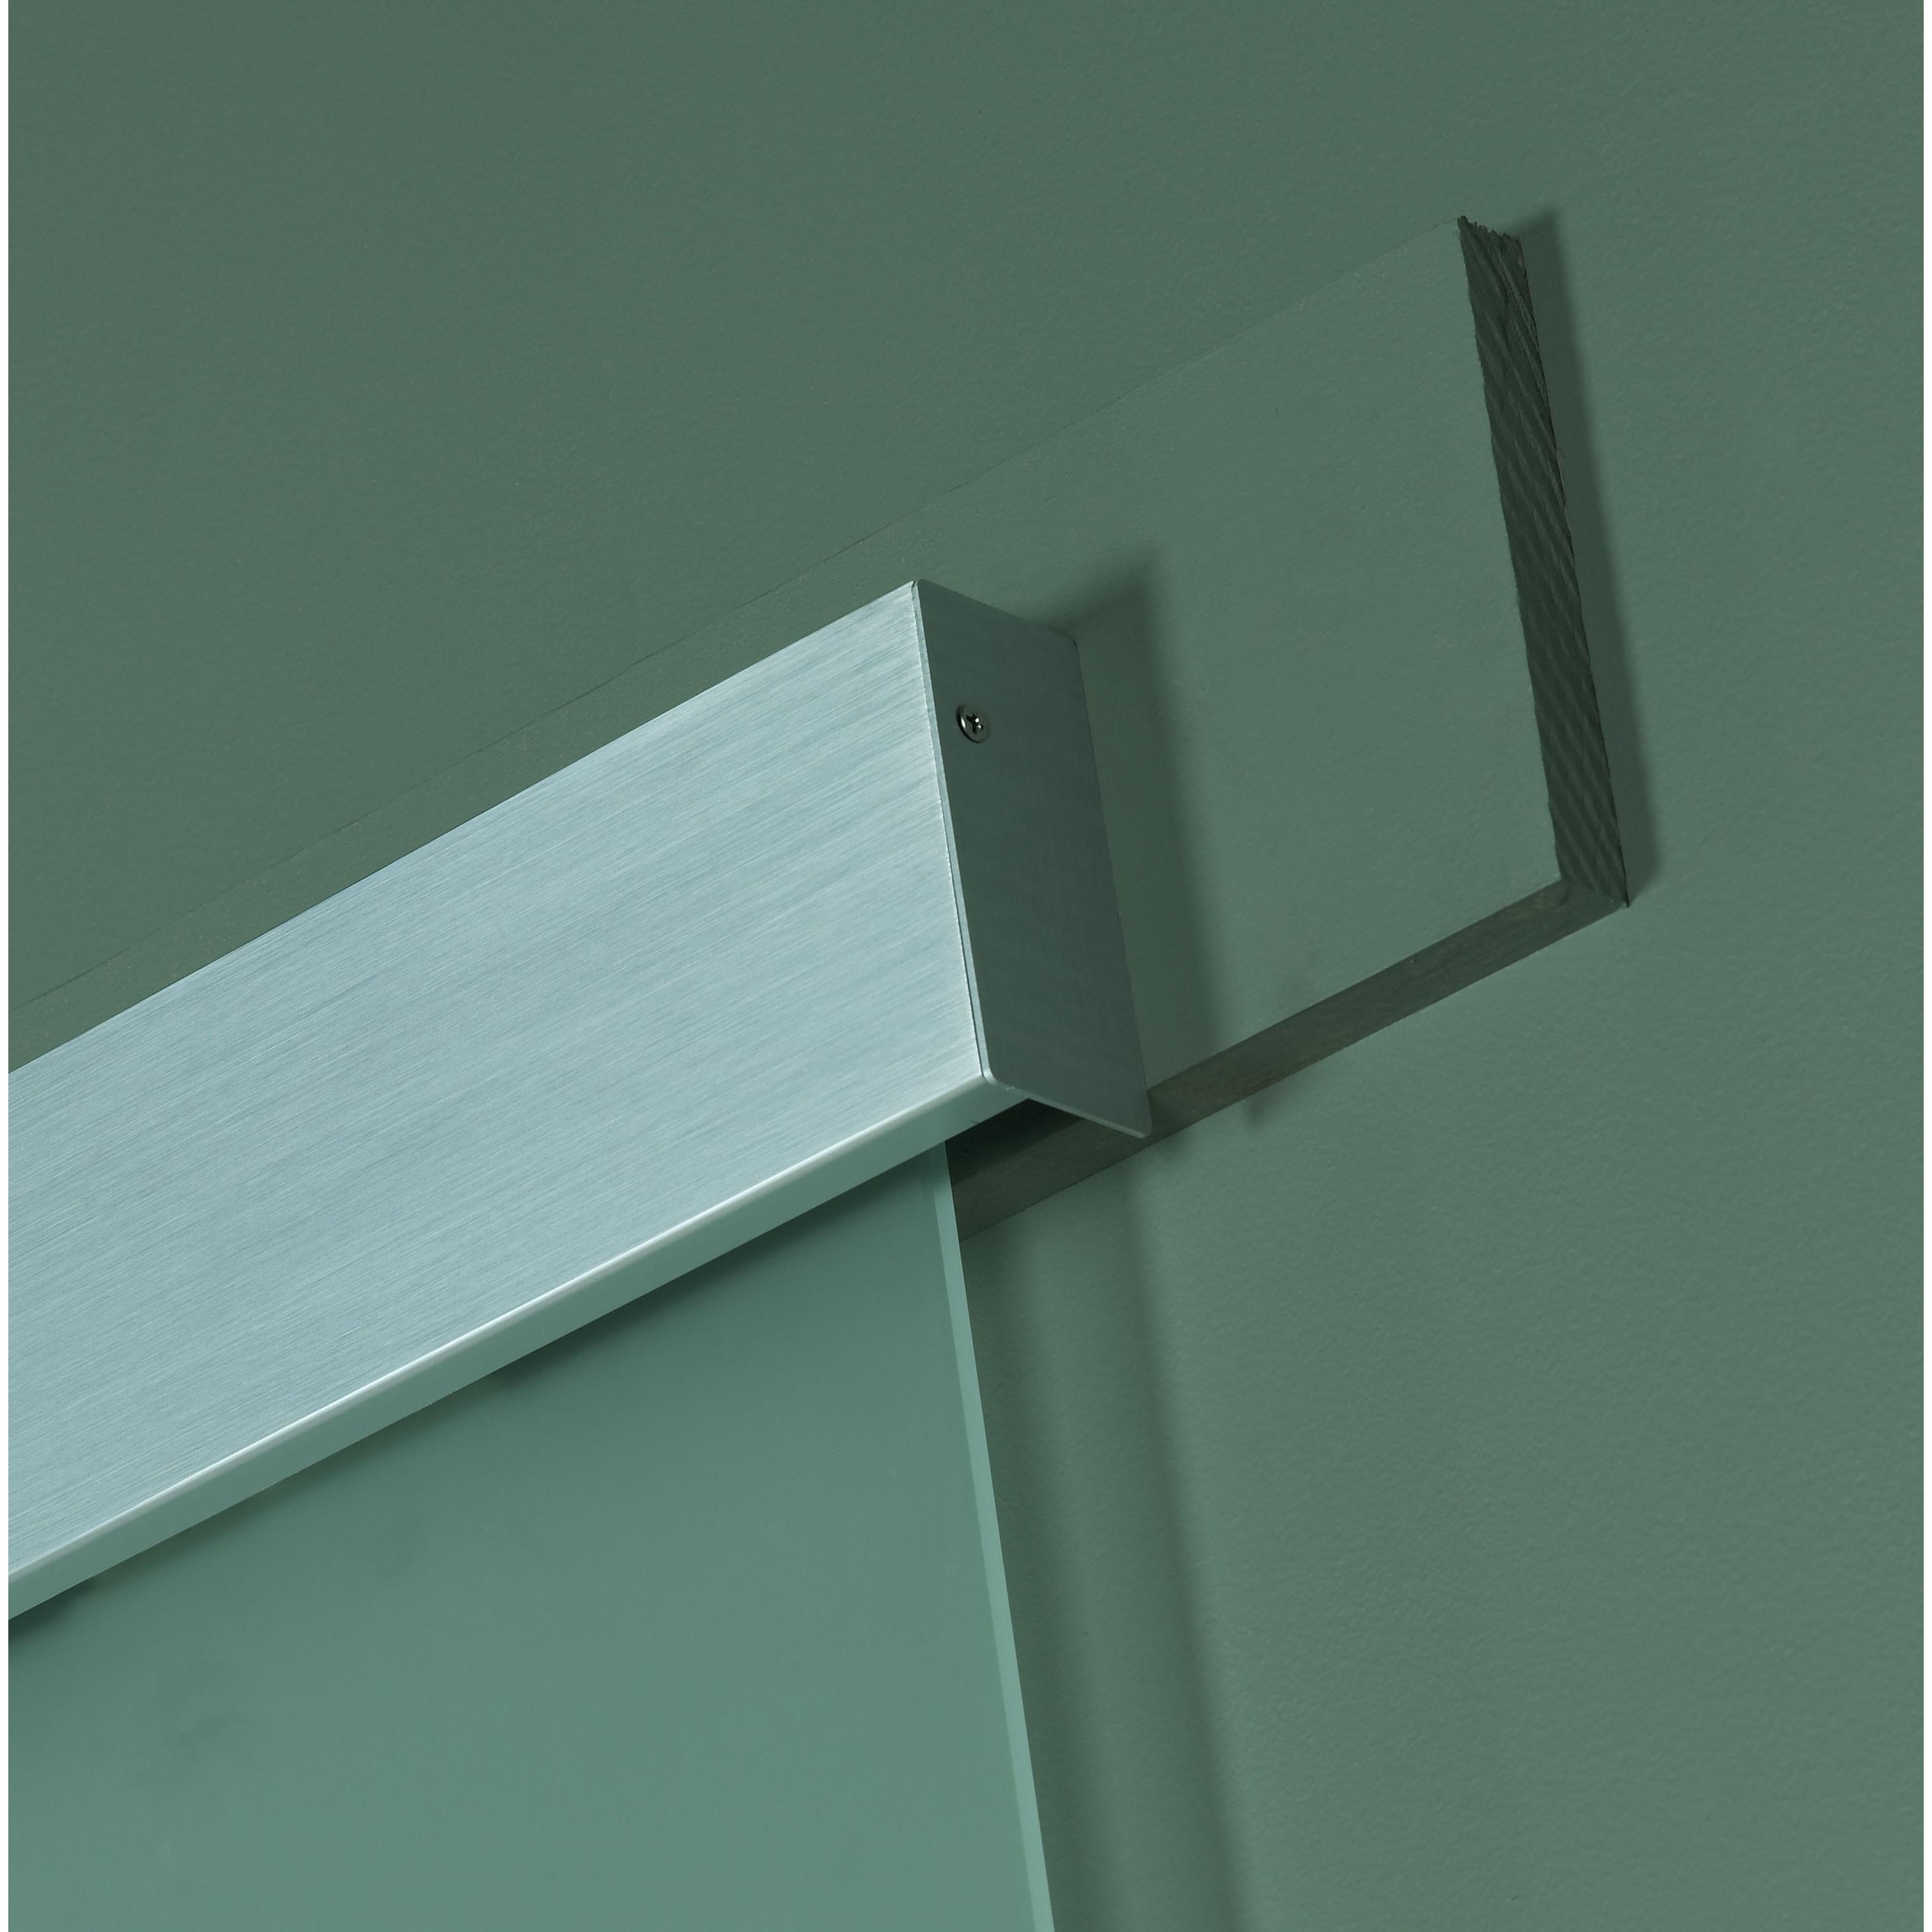 Shop Opaque Glass Barn Door (30x96) - Free Shipping Today ...